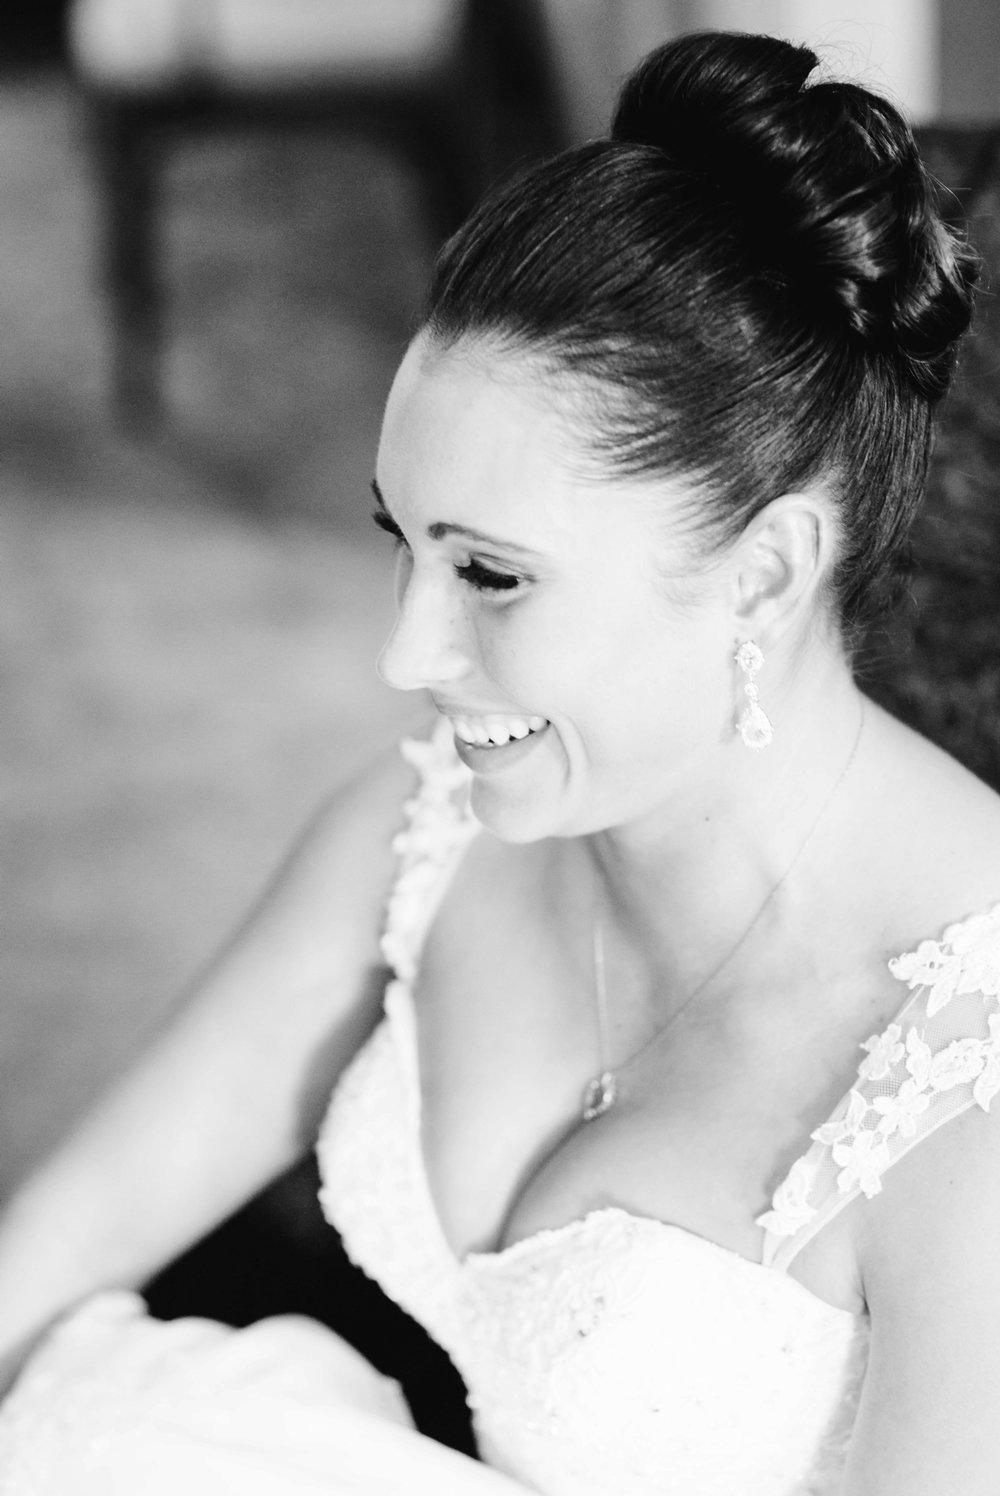 chicago-fine-art-wedding-photography-tyree4